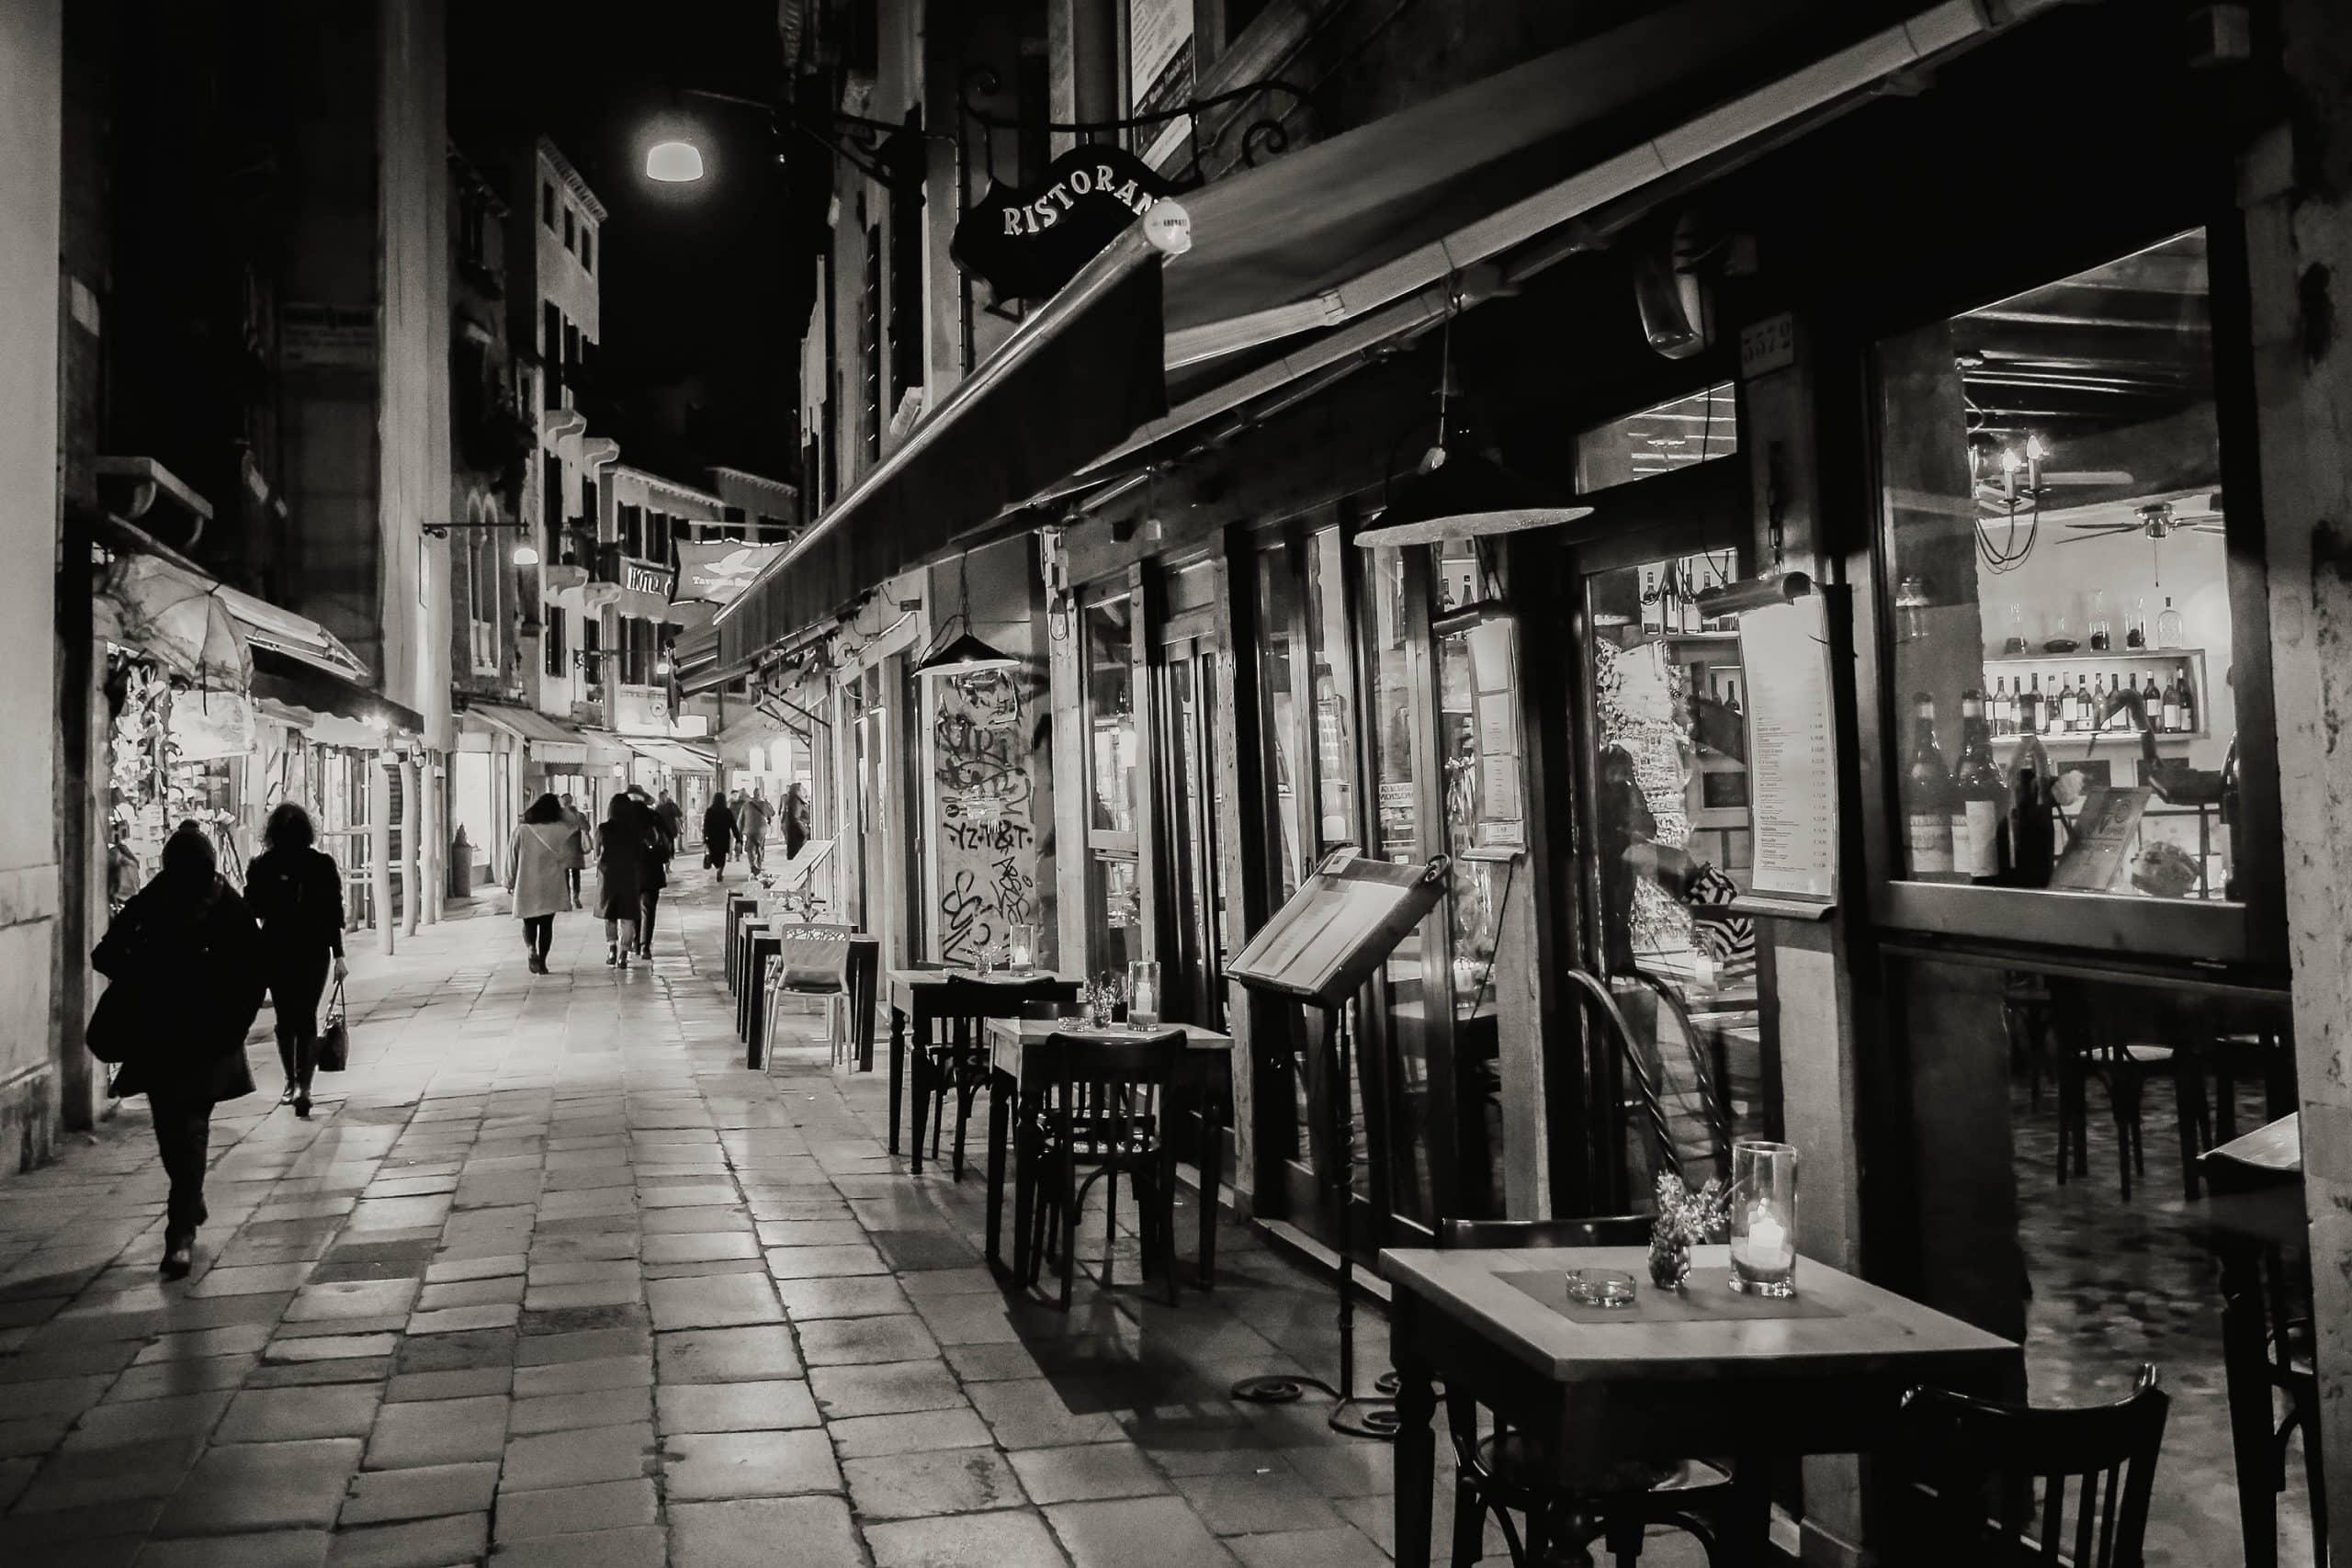 Narrow,Street,In,Venezia,At,Night.,Black,And,White,Photo.